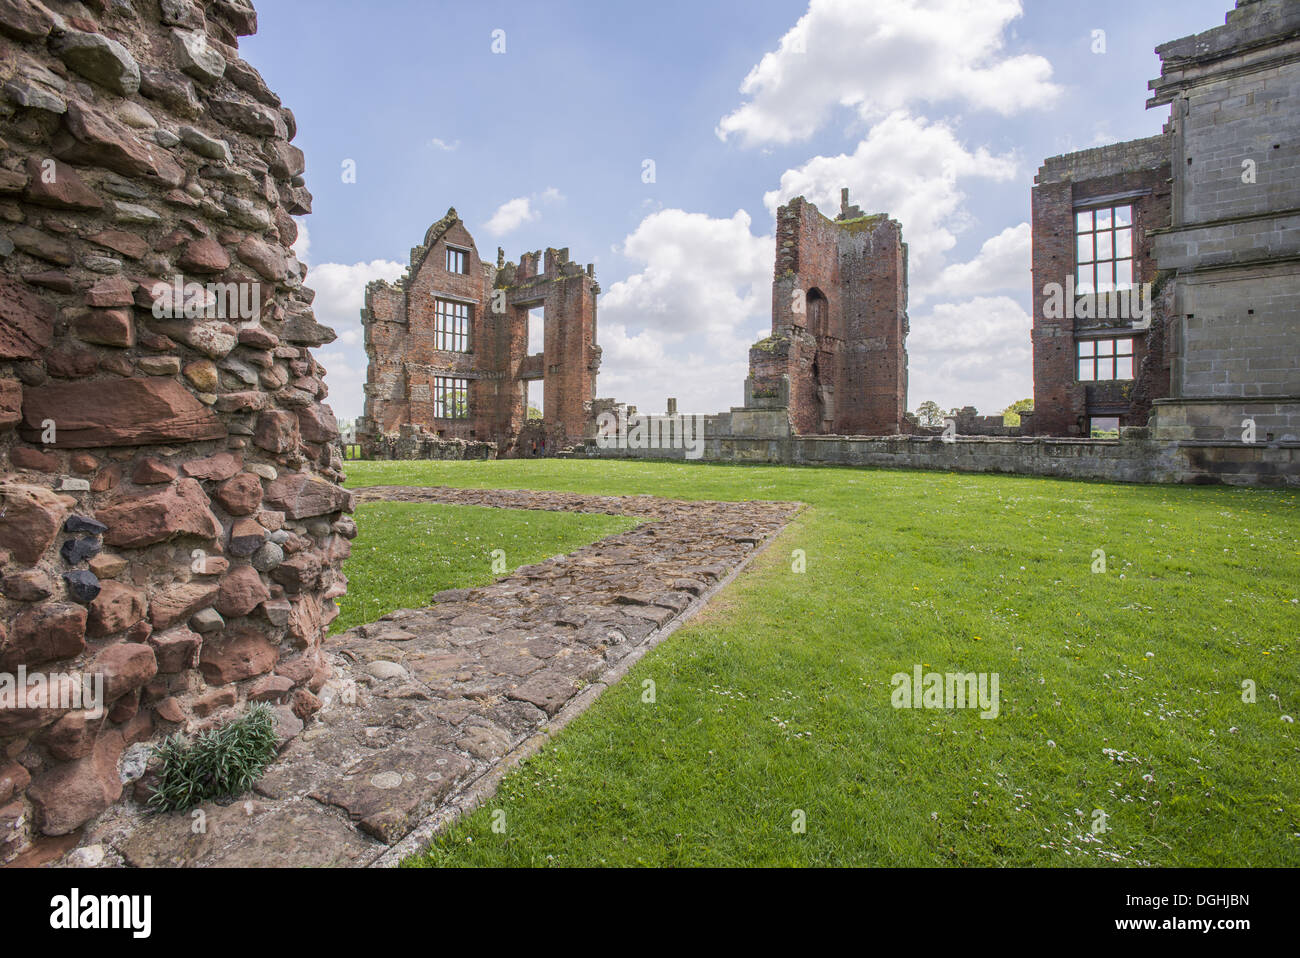 Ruins of Elizabethan manor house, Moreton Corbet Castle, Moreton Corbet, Shropshire, England, May - Stock Image